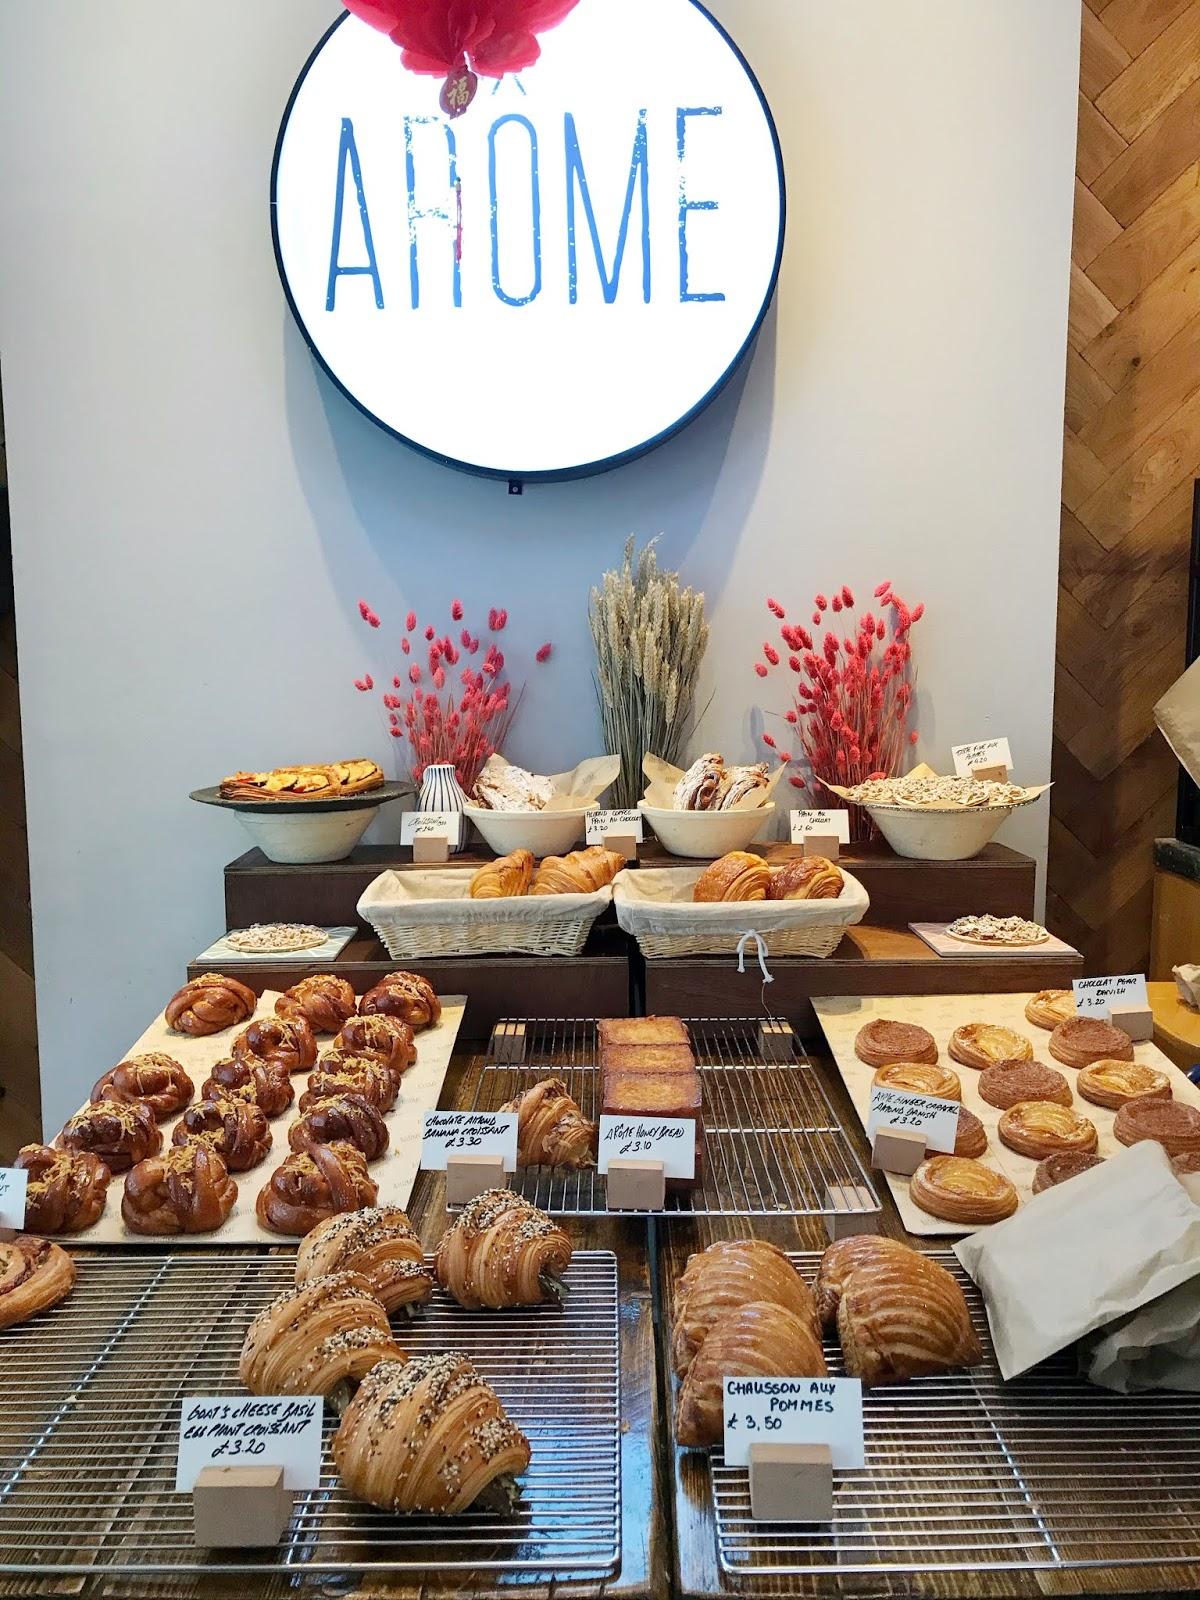 Arôme-Soho-London-Artisan-Bakery